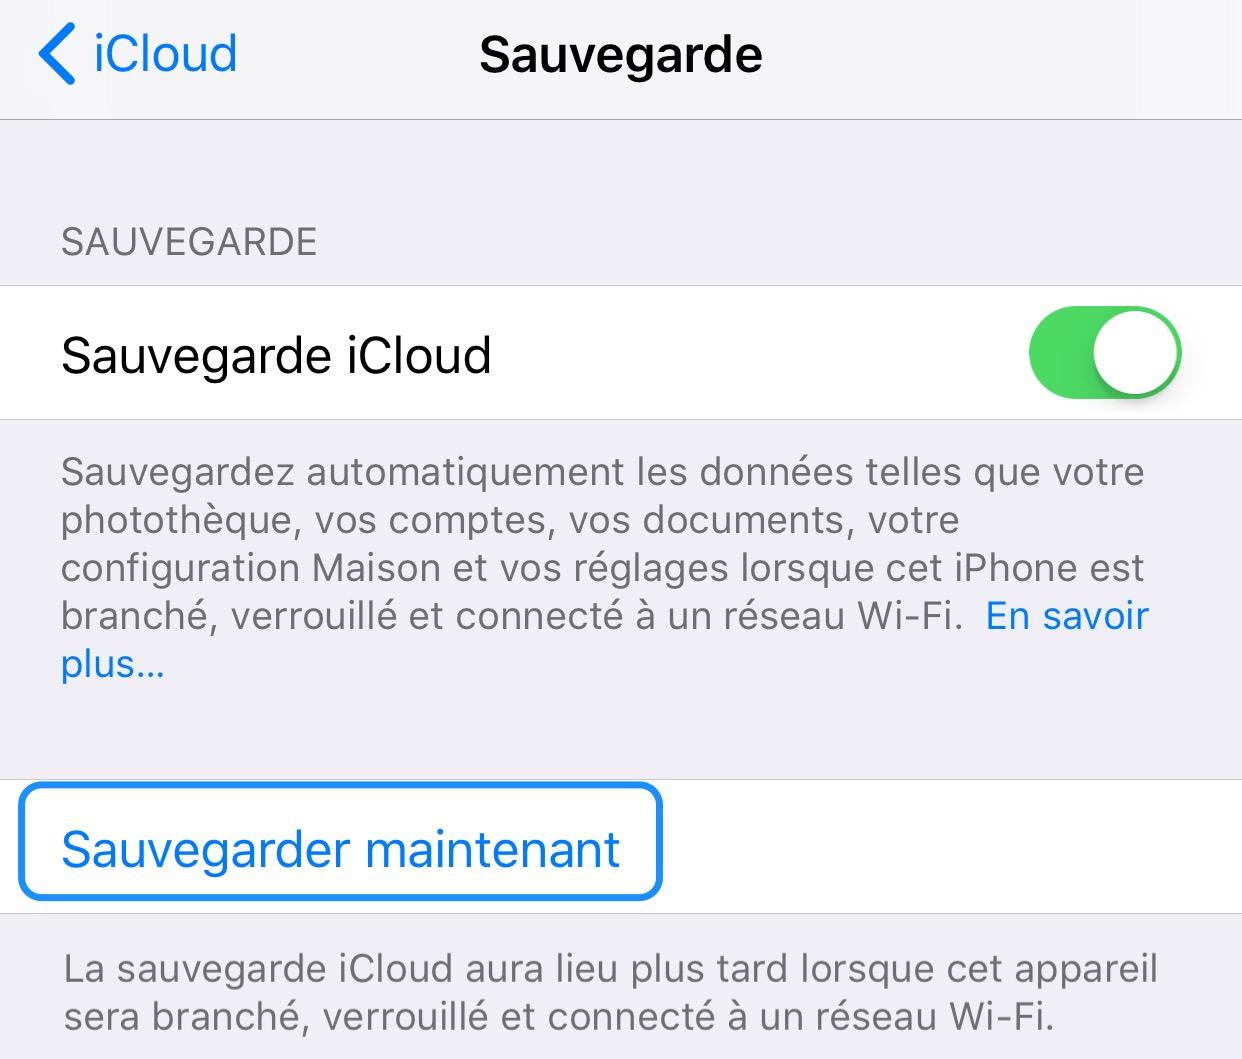 Réglages iOS sauvegarder son iPhone